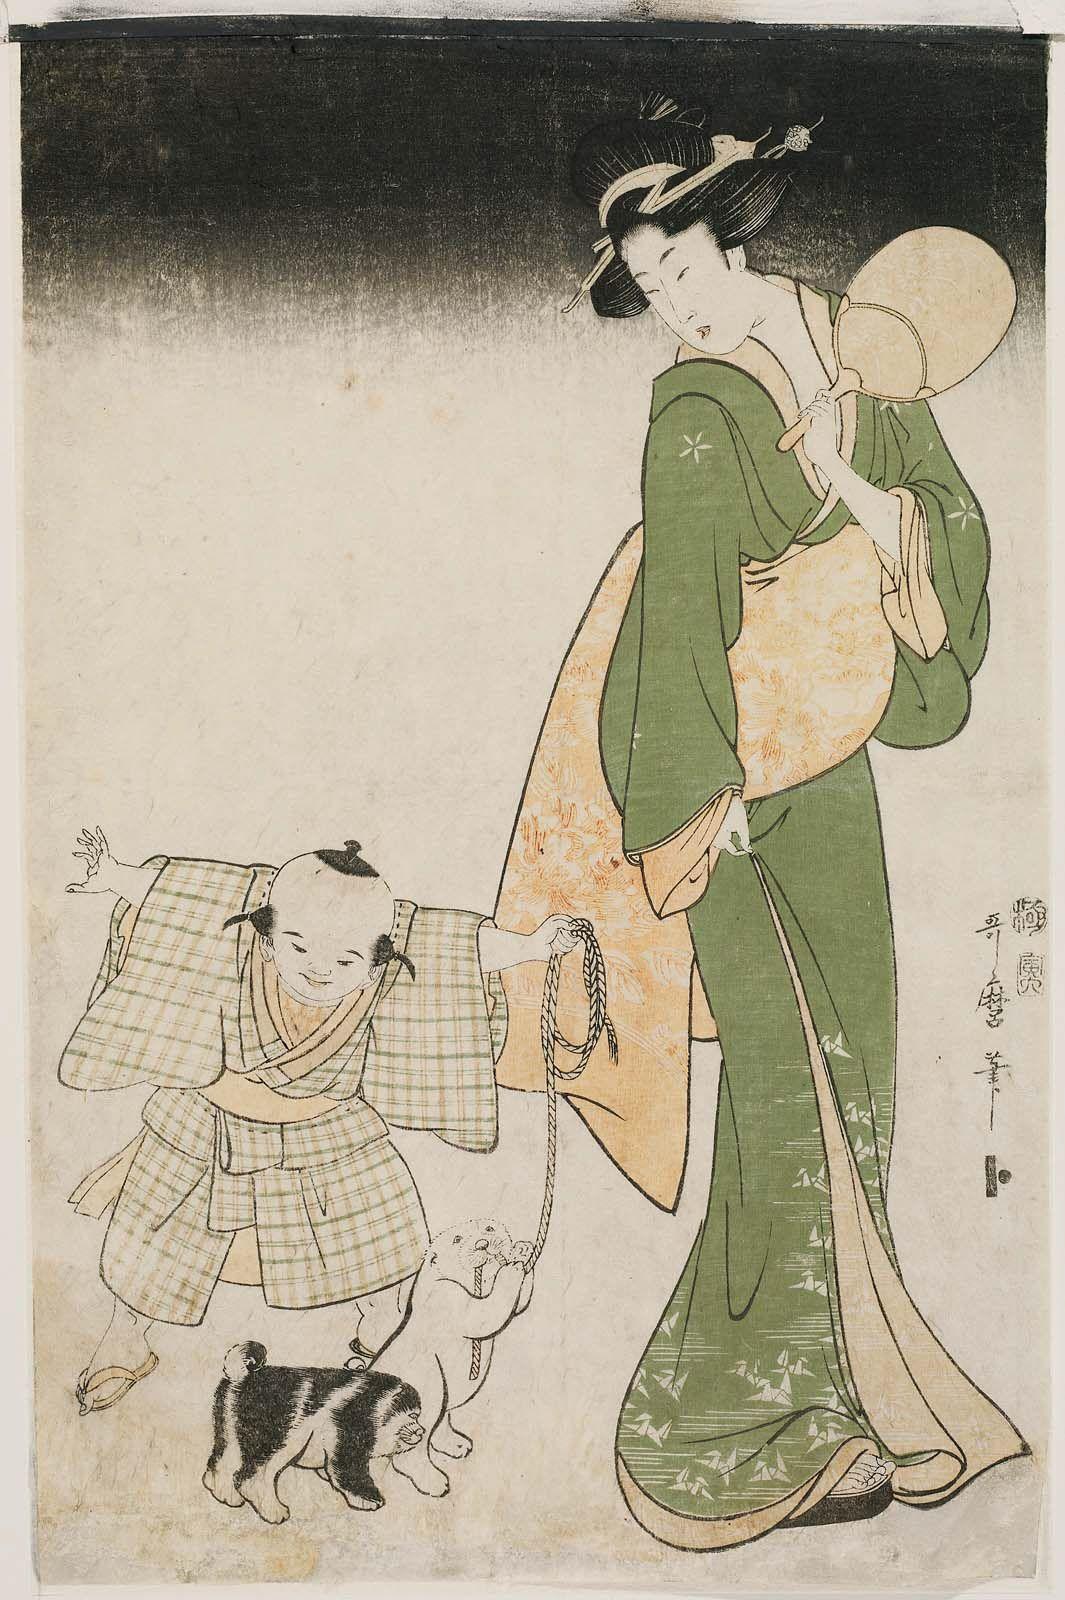 Mother and Child with Two Puppies on a Summer Night 夏の宵 Japanese Edo period 1806 (Bunka 3), 6th month Artist Kitagawa Utamaro I (Japanese, (?)–1806),